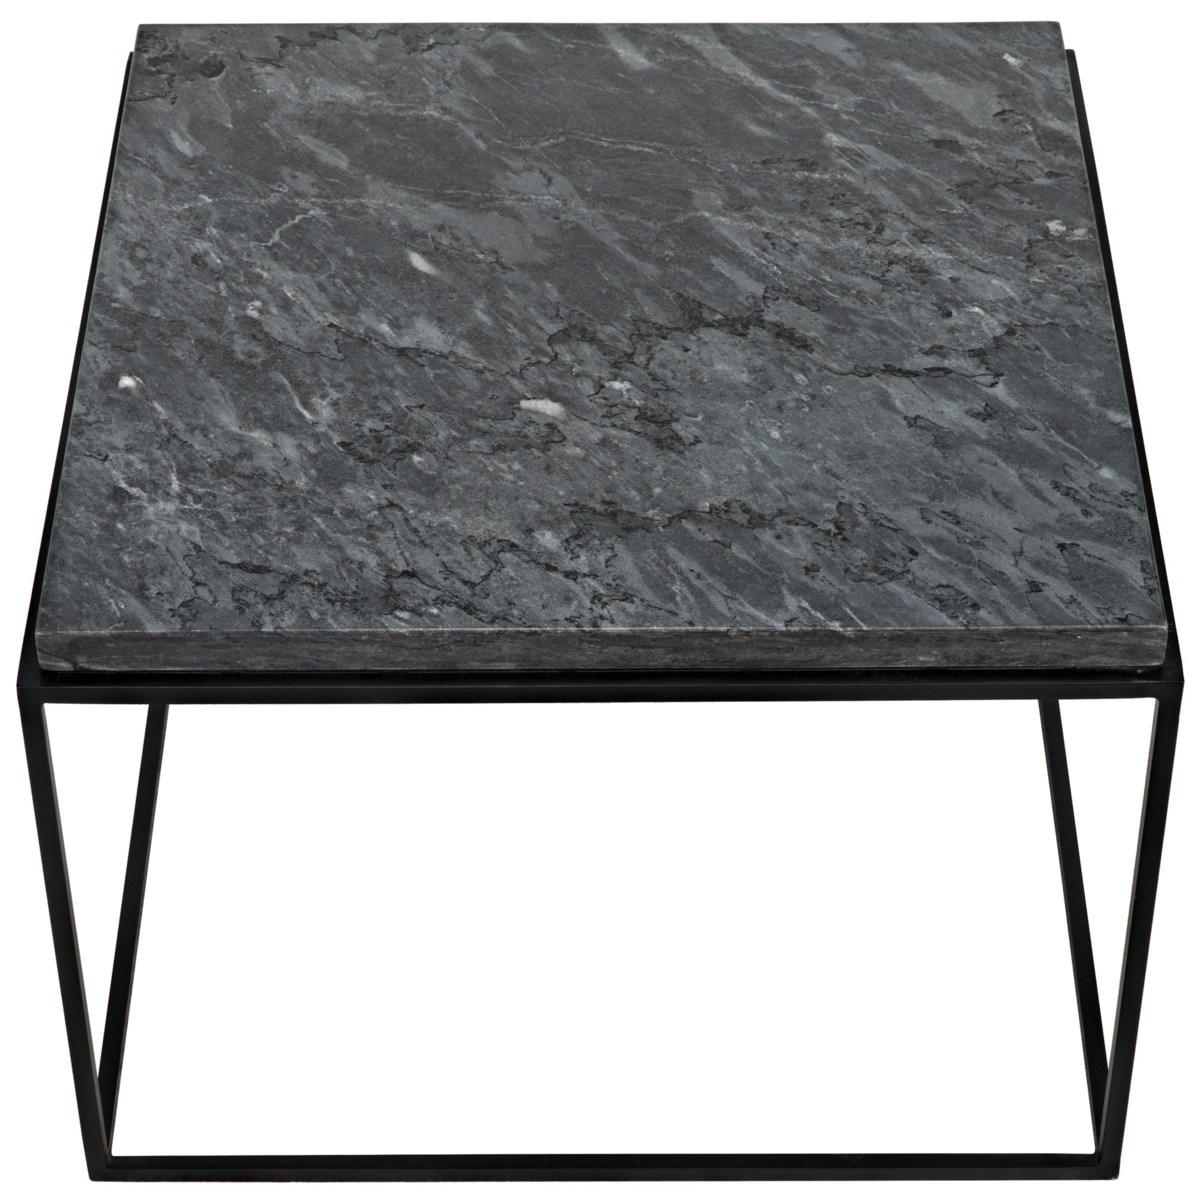 Lomax Coffee Table, Black Metal Finish with Black Stone